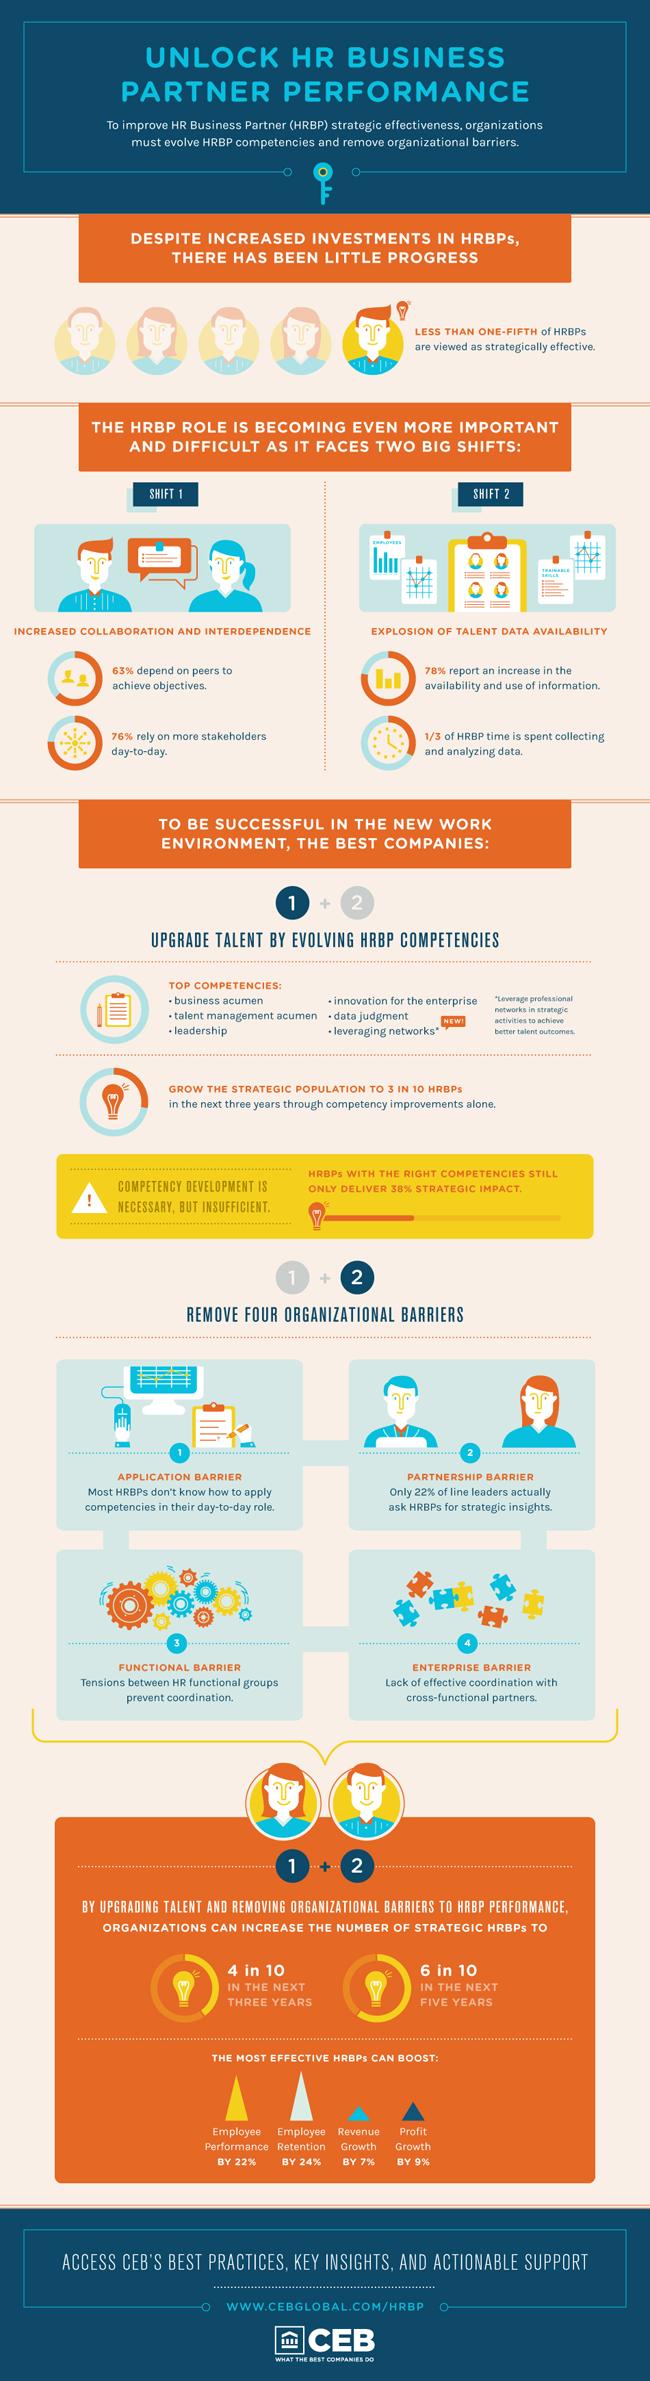 HR generalist, HR business partner, HR competency models, HR skills ...